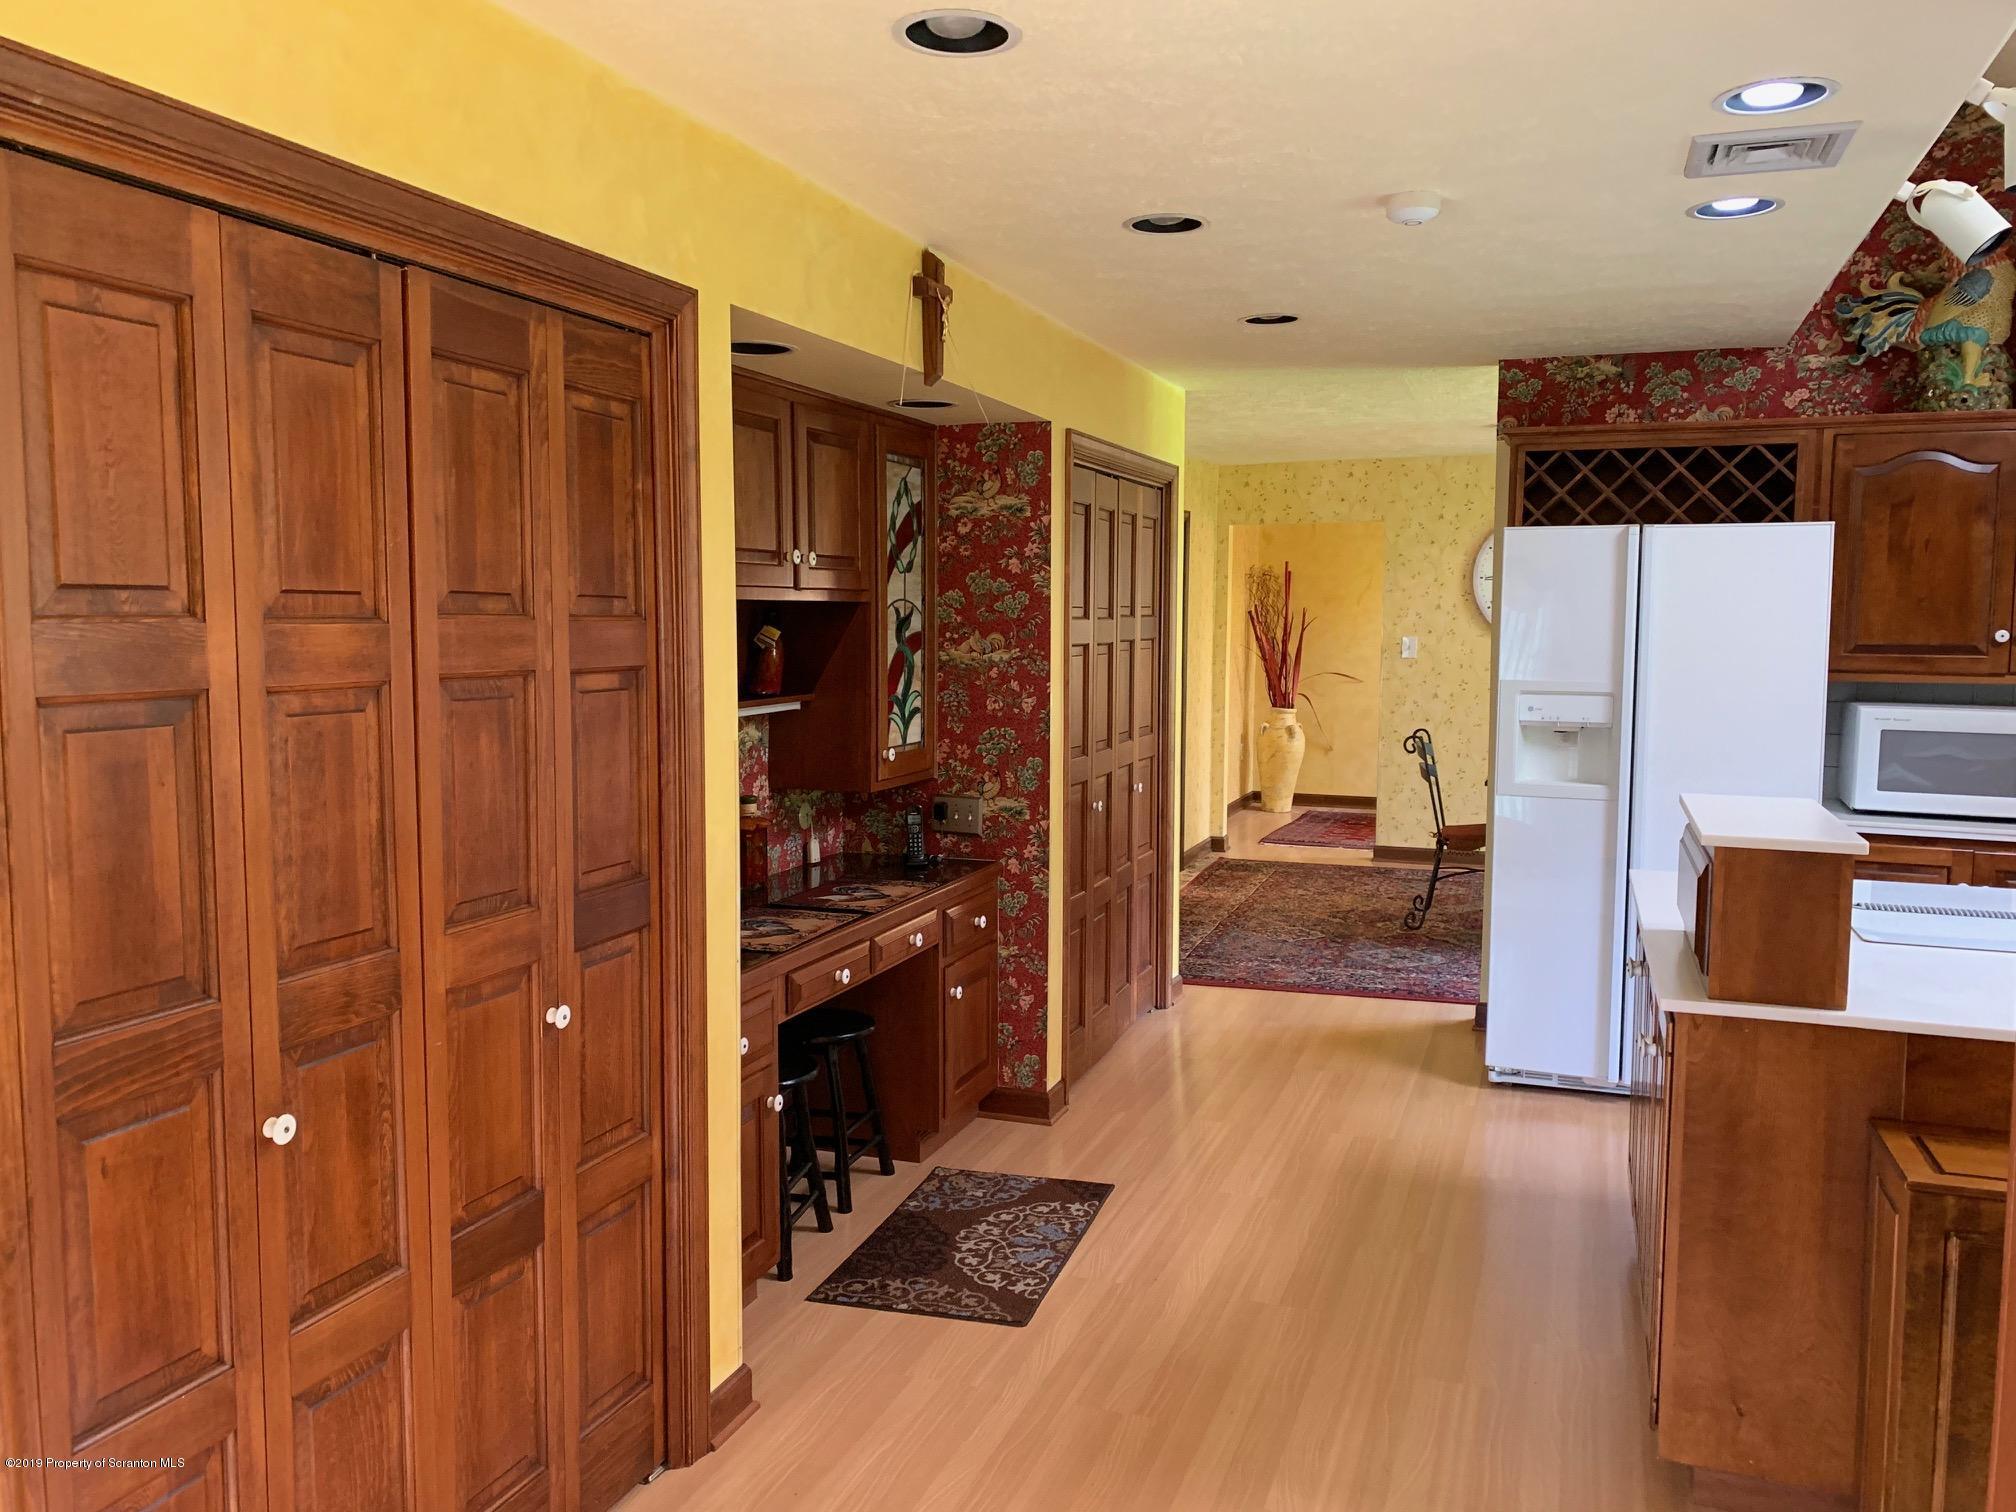 2200 Lakeside Drive, Harveys Lake, Pennsylvania 18618, 4 Bedrooms Bedrooms, 17 Rooms Rooms,5 BathroomsBathrooms,Single Family,For Sale,Lakeside Drive,19-2549